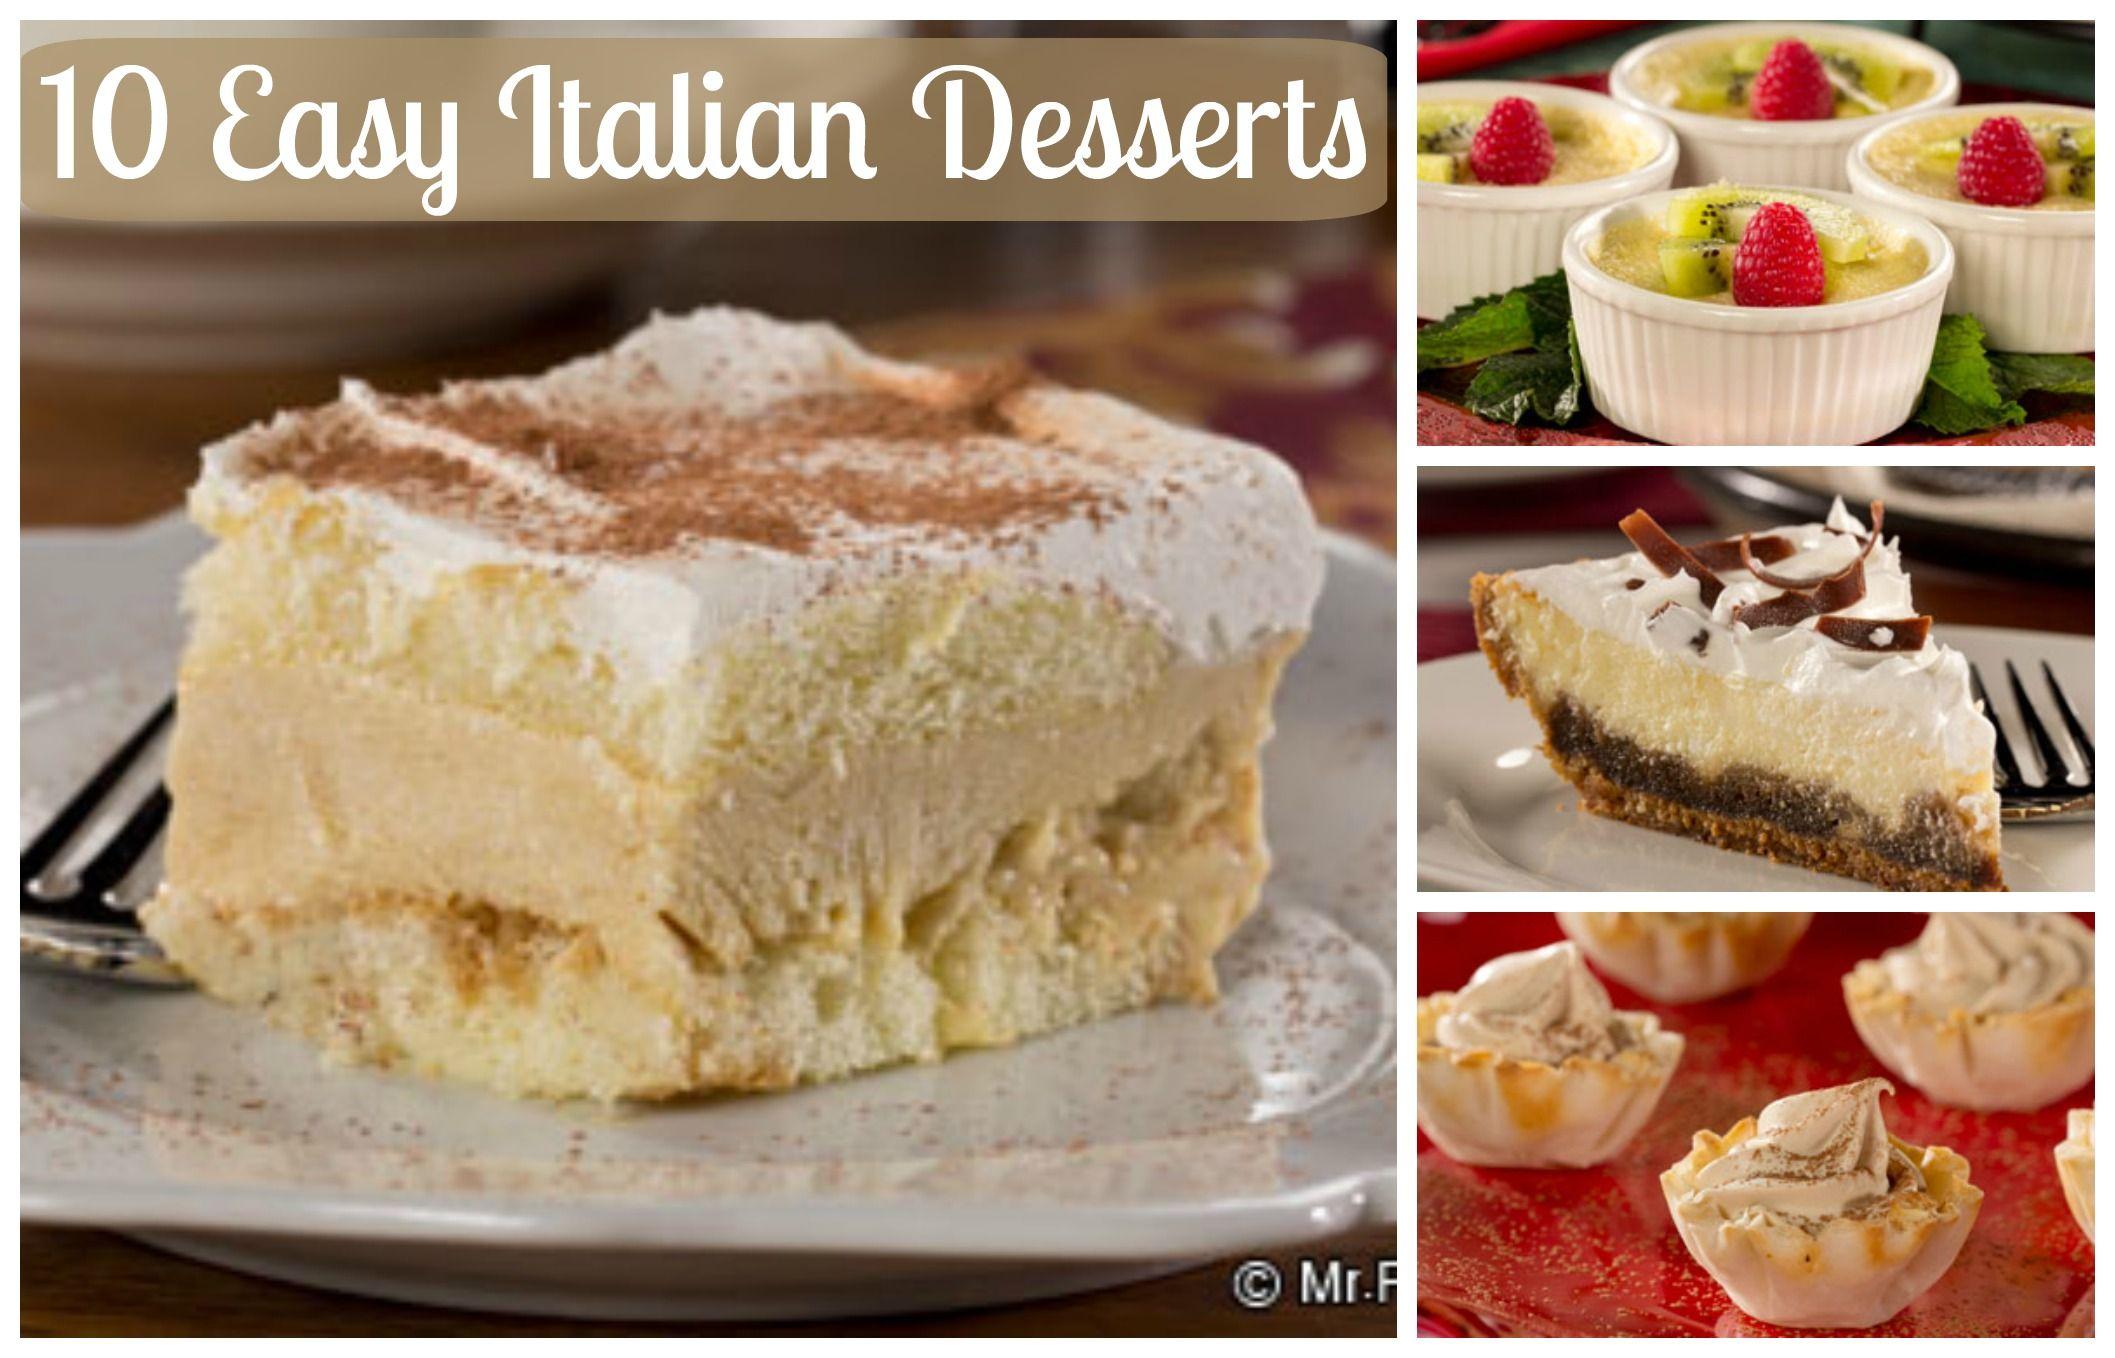 10 Easy Italian Desserts Diabetes Friendly Italian Dessert Recipes Italian Desserts Easy Italian Desserts Desserts